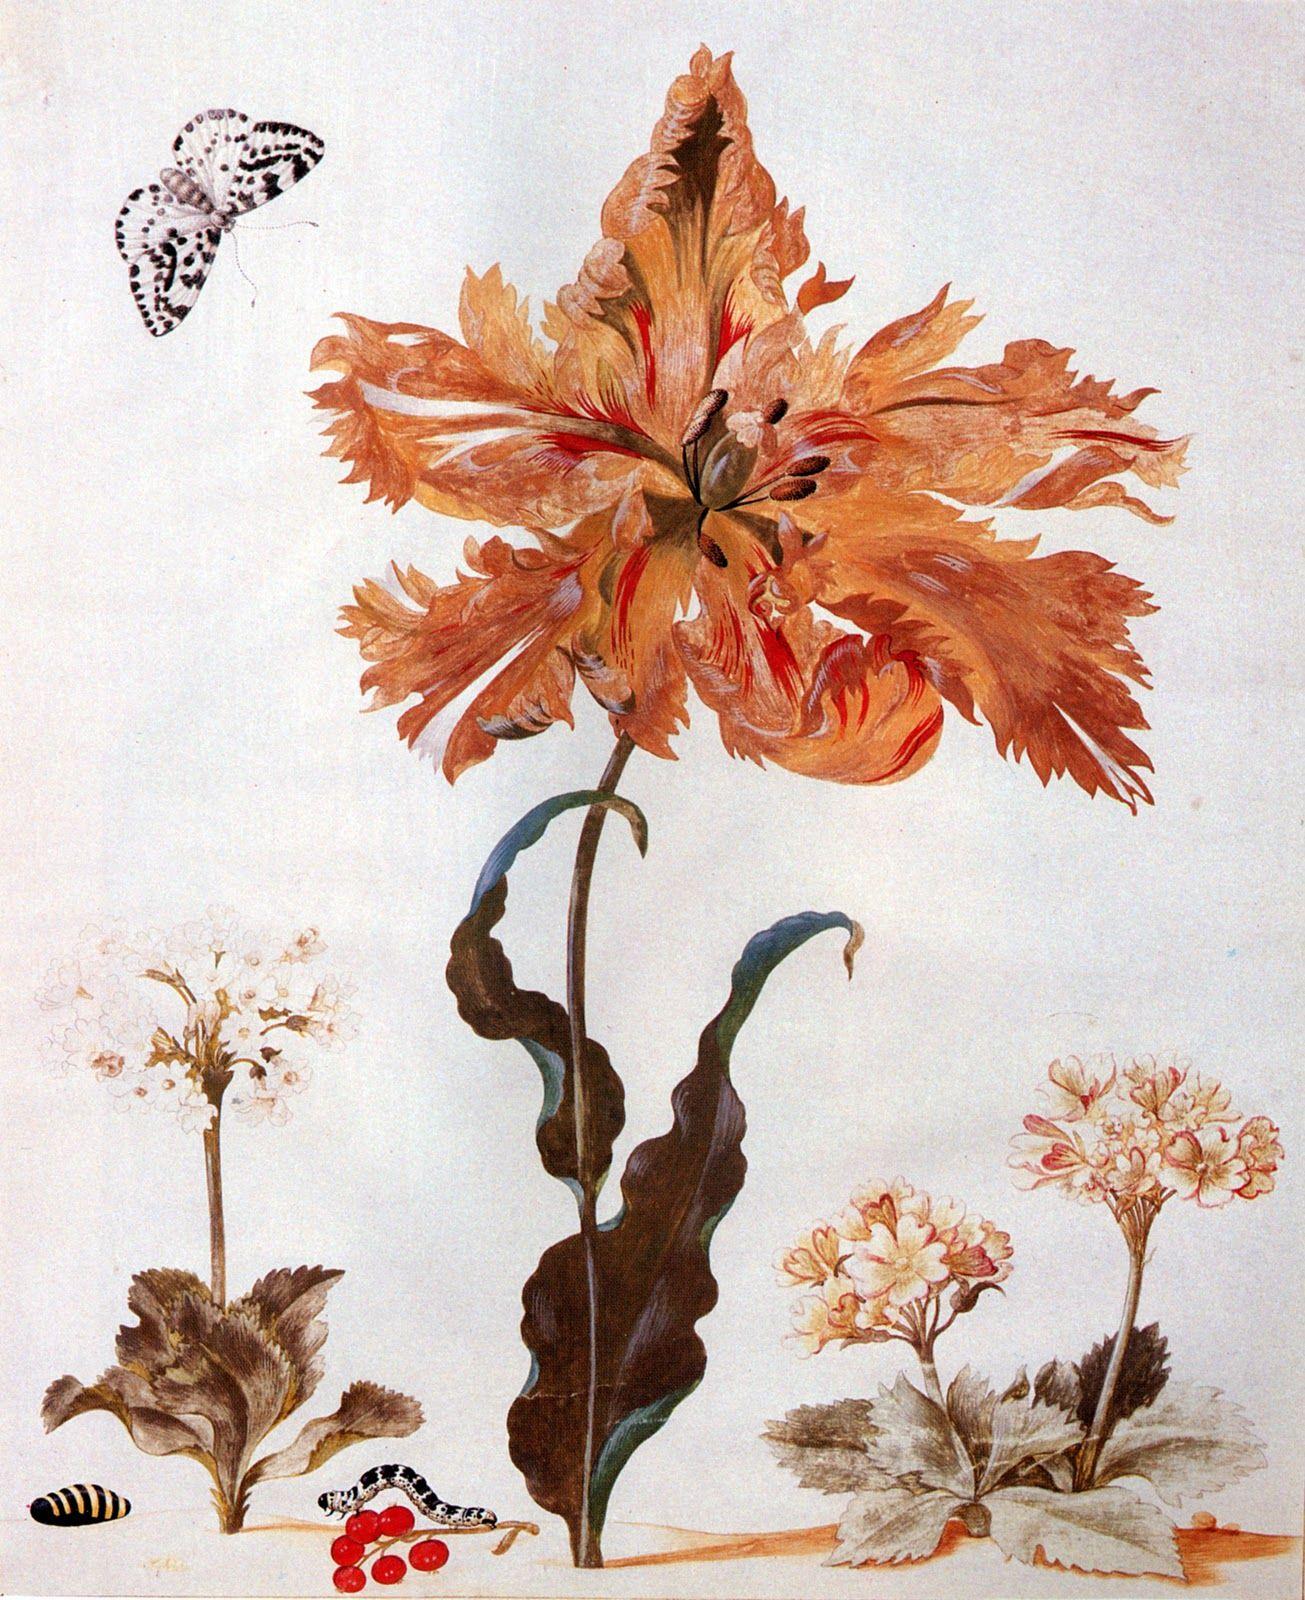 Maria Sybilla Merian Impressions Botaniques Gravures Botaniques